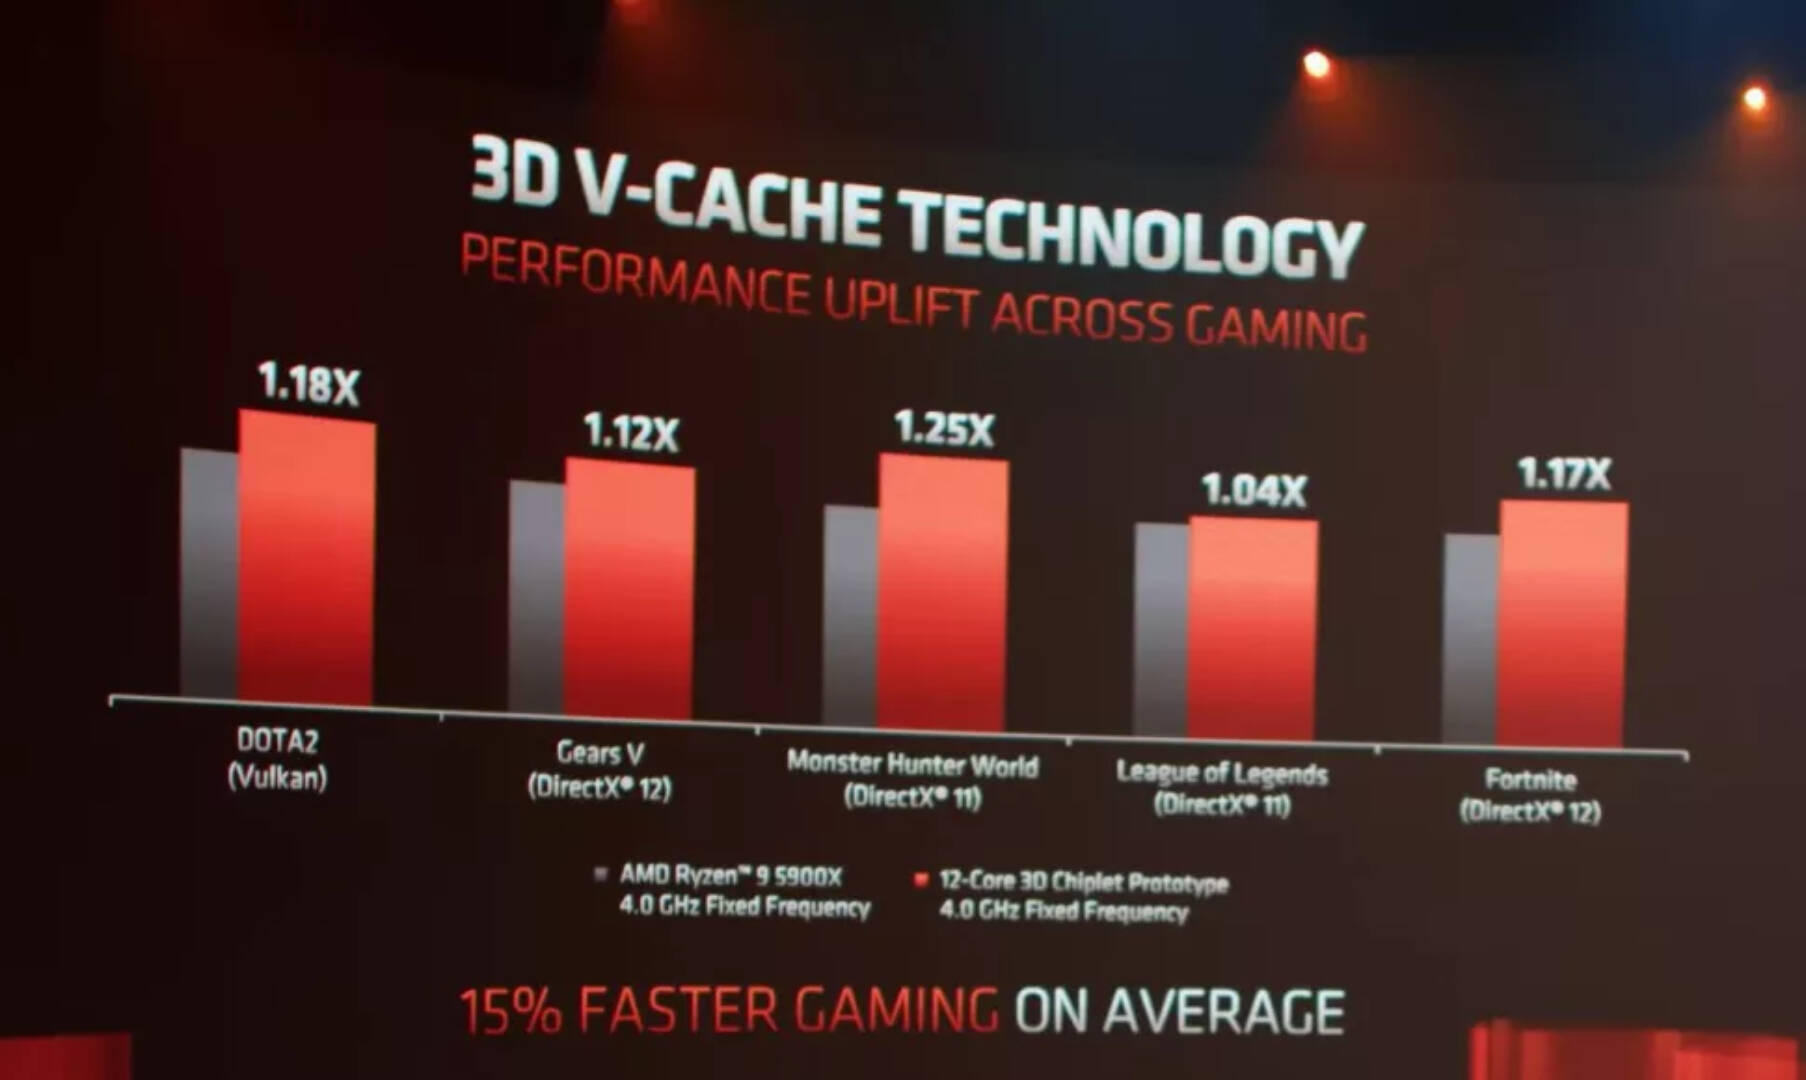 AMD Ryzen Chiplet 3D V-Cache